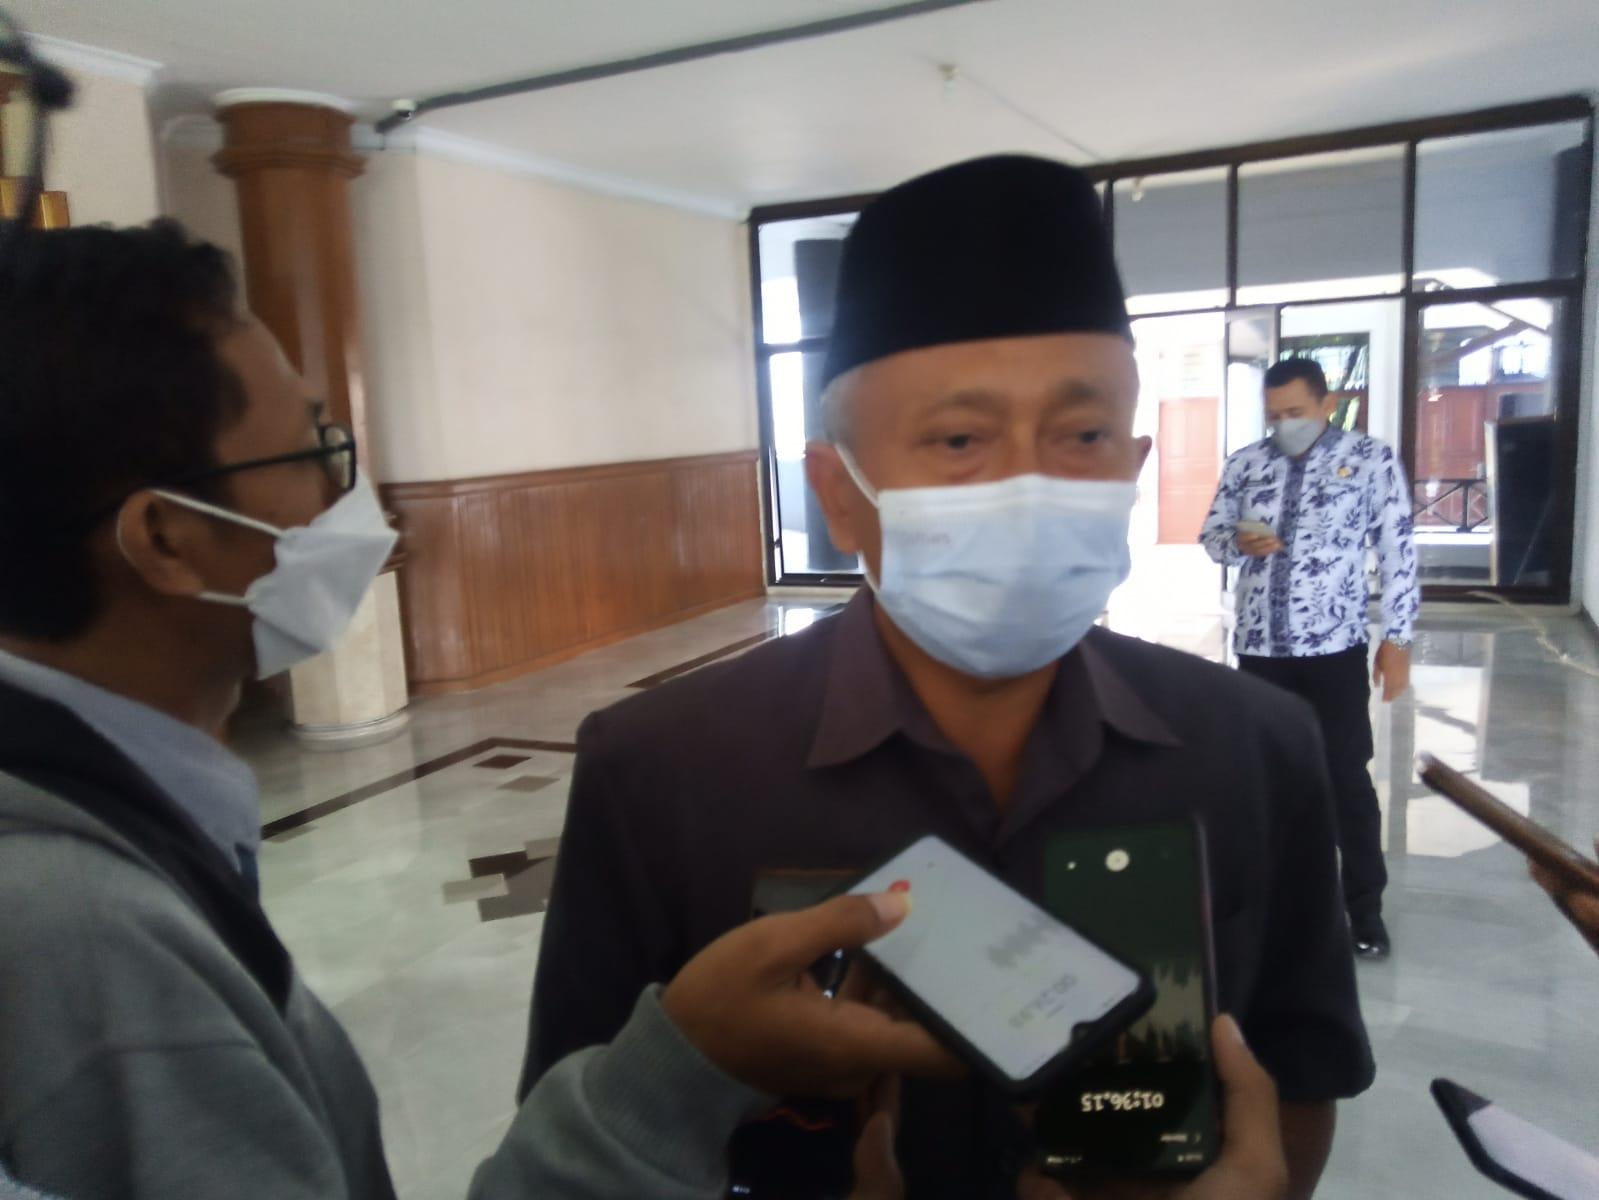 Ketua DPRD Kabupaten Tuban H.M. Miyadi saat ditemui usai memimpin Rapat Paripurna di Gedung DPRD Tuban, Kamis (14/10/2021). (Foto: Mochamad Abdurrochim/Tugu Jatim)